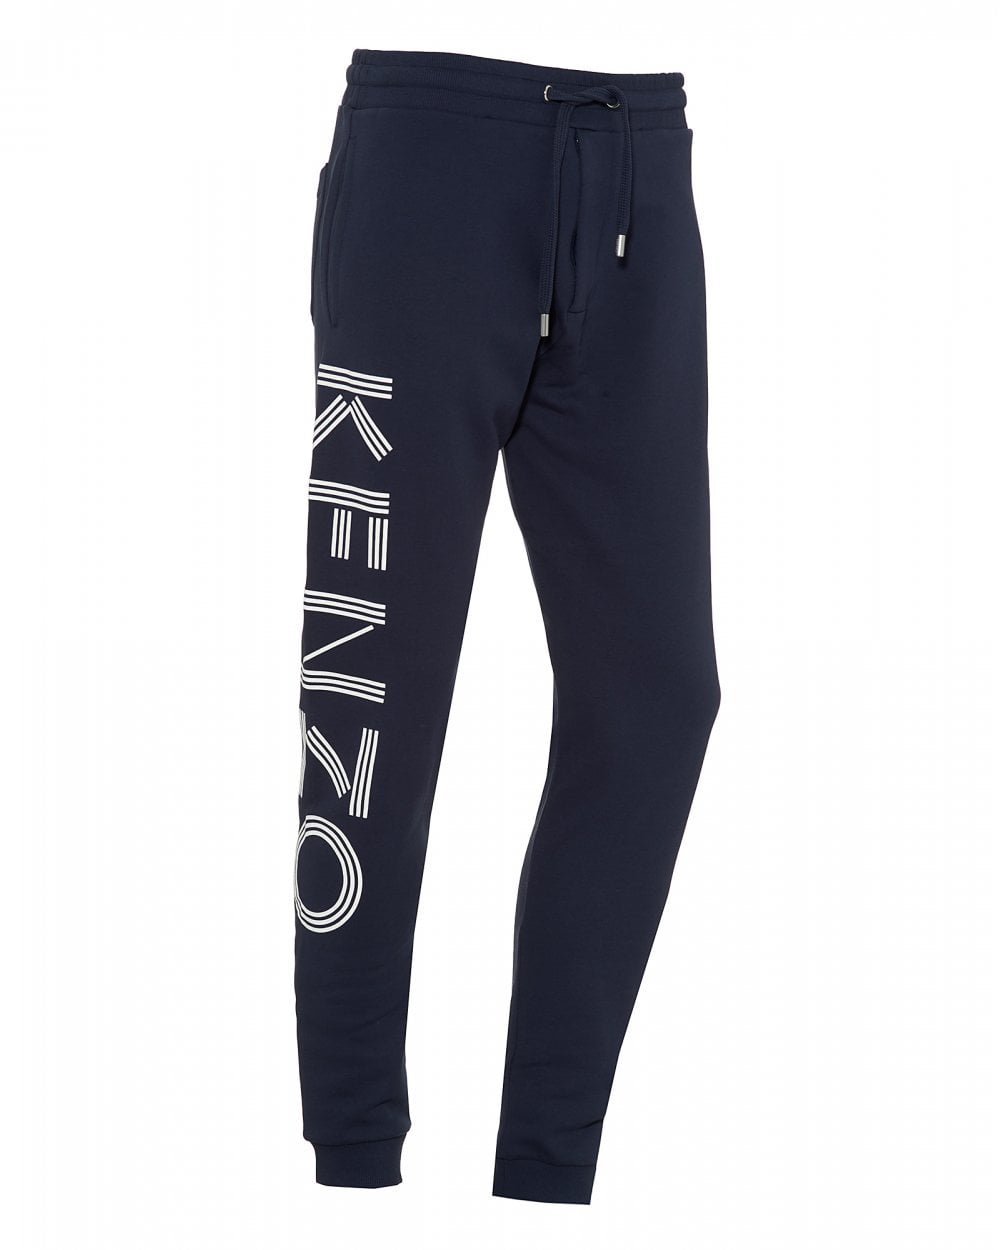 b23093c7 Kenzo Mens Leg Logo Joggers, Ink Blue Sweatpants